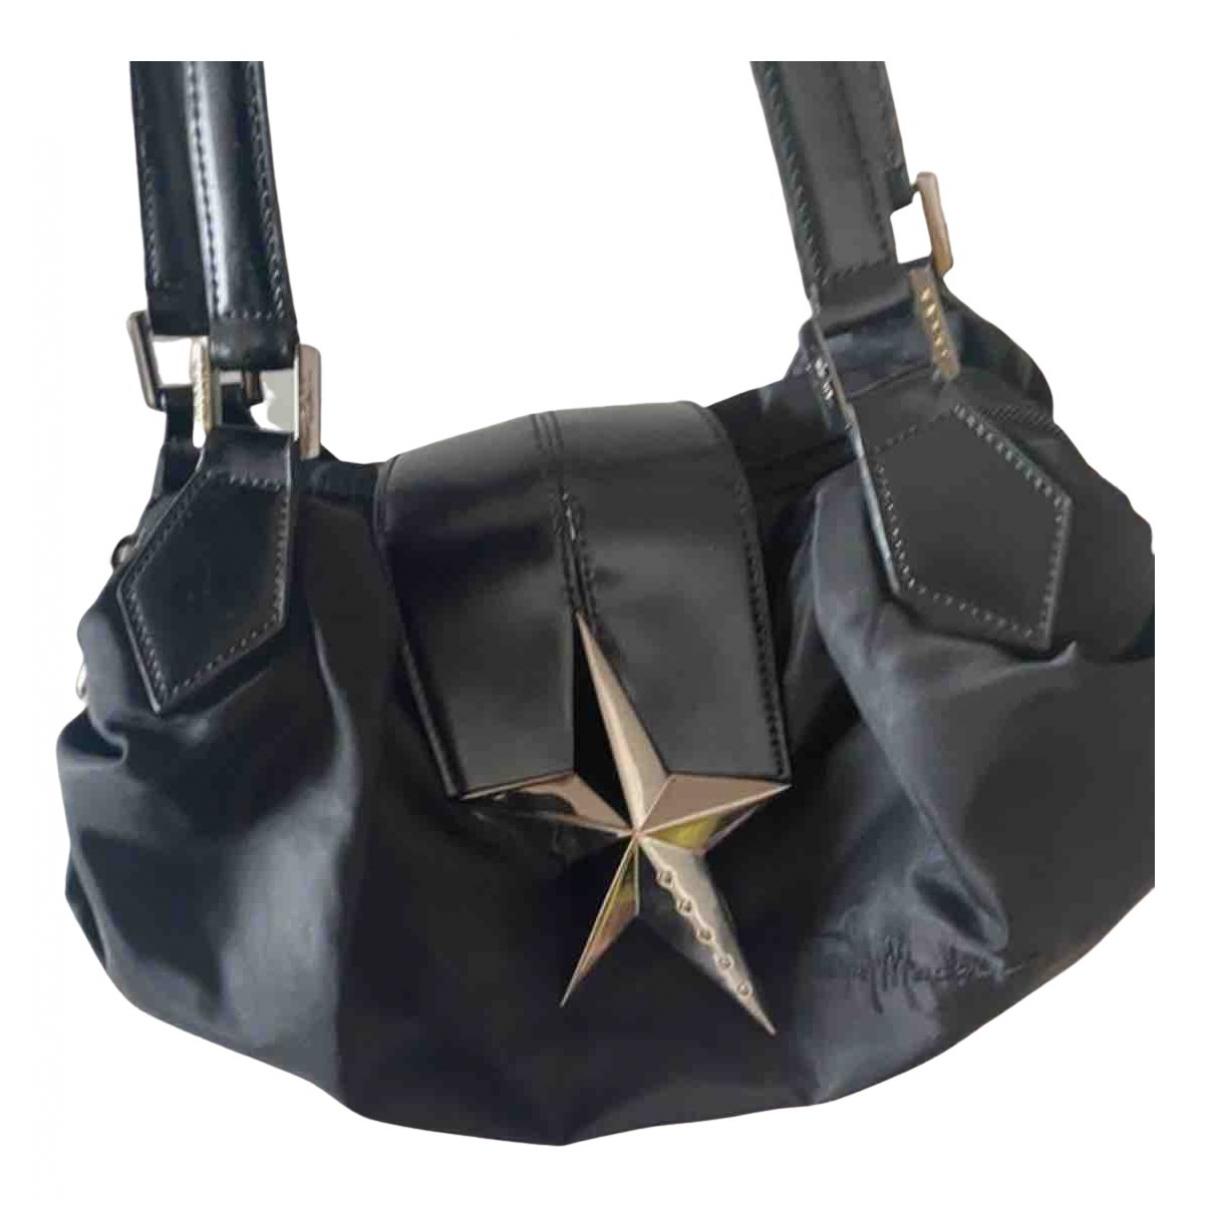 Thierry Mugler N Black handbag for Women N